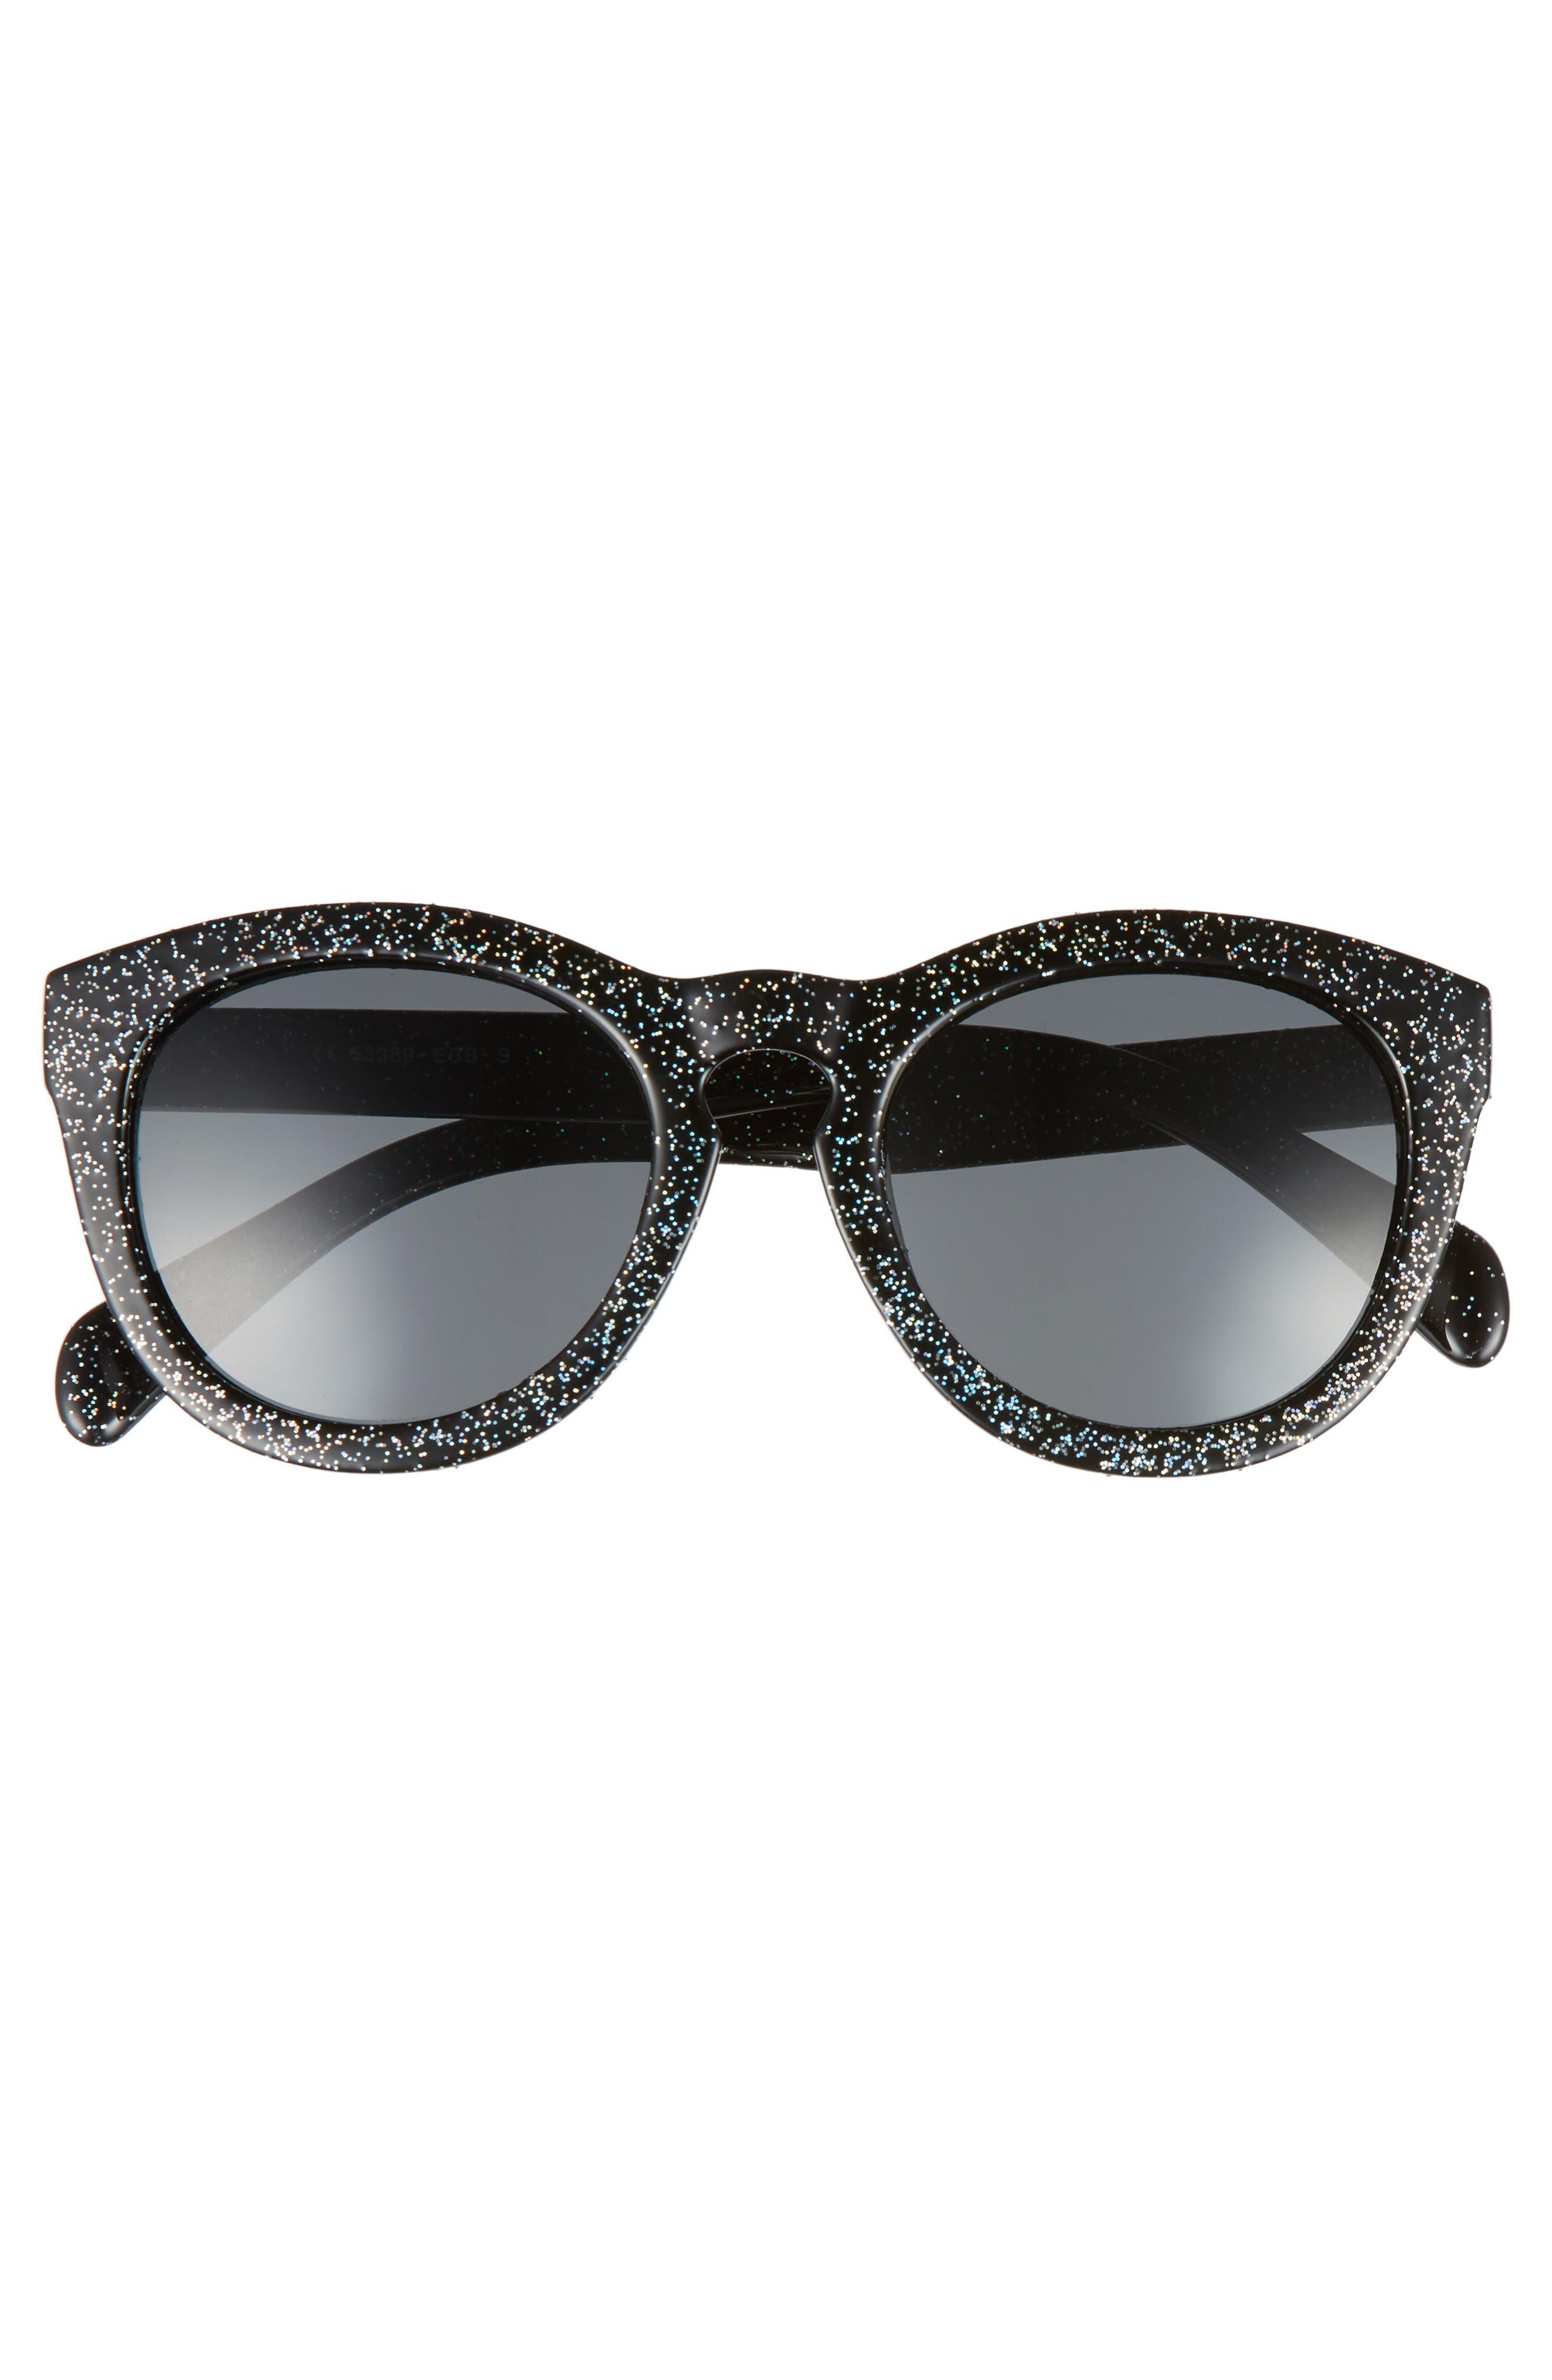 50mm Glitter Round Sunglasses,                             Alternate thumbnail 3, color,                             Black